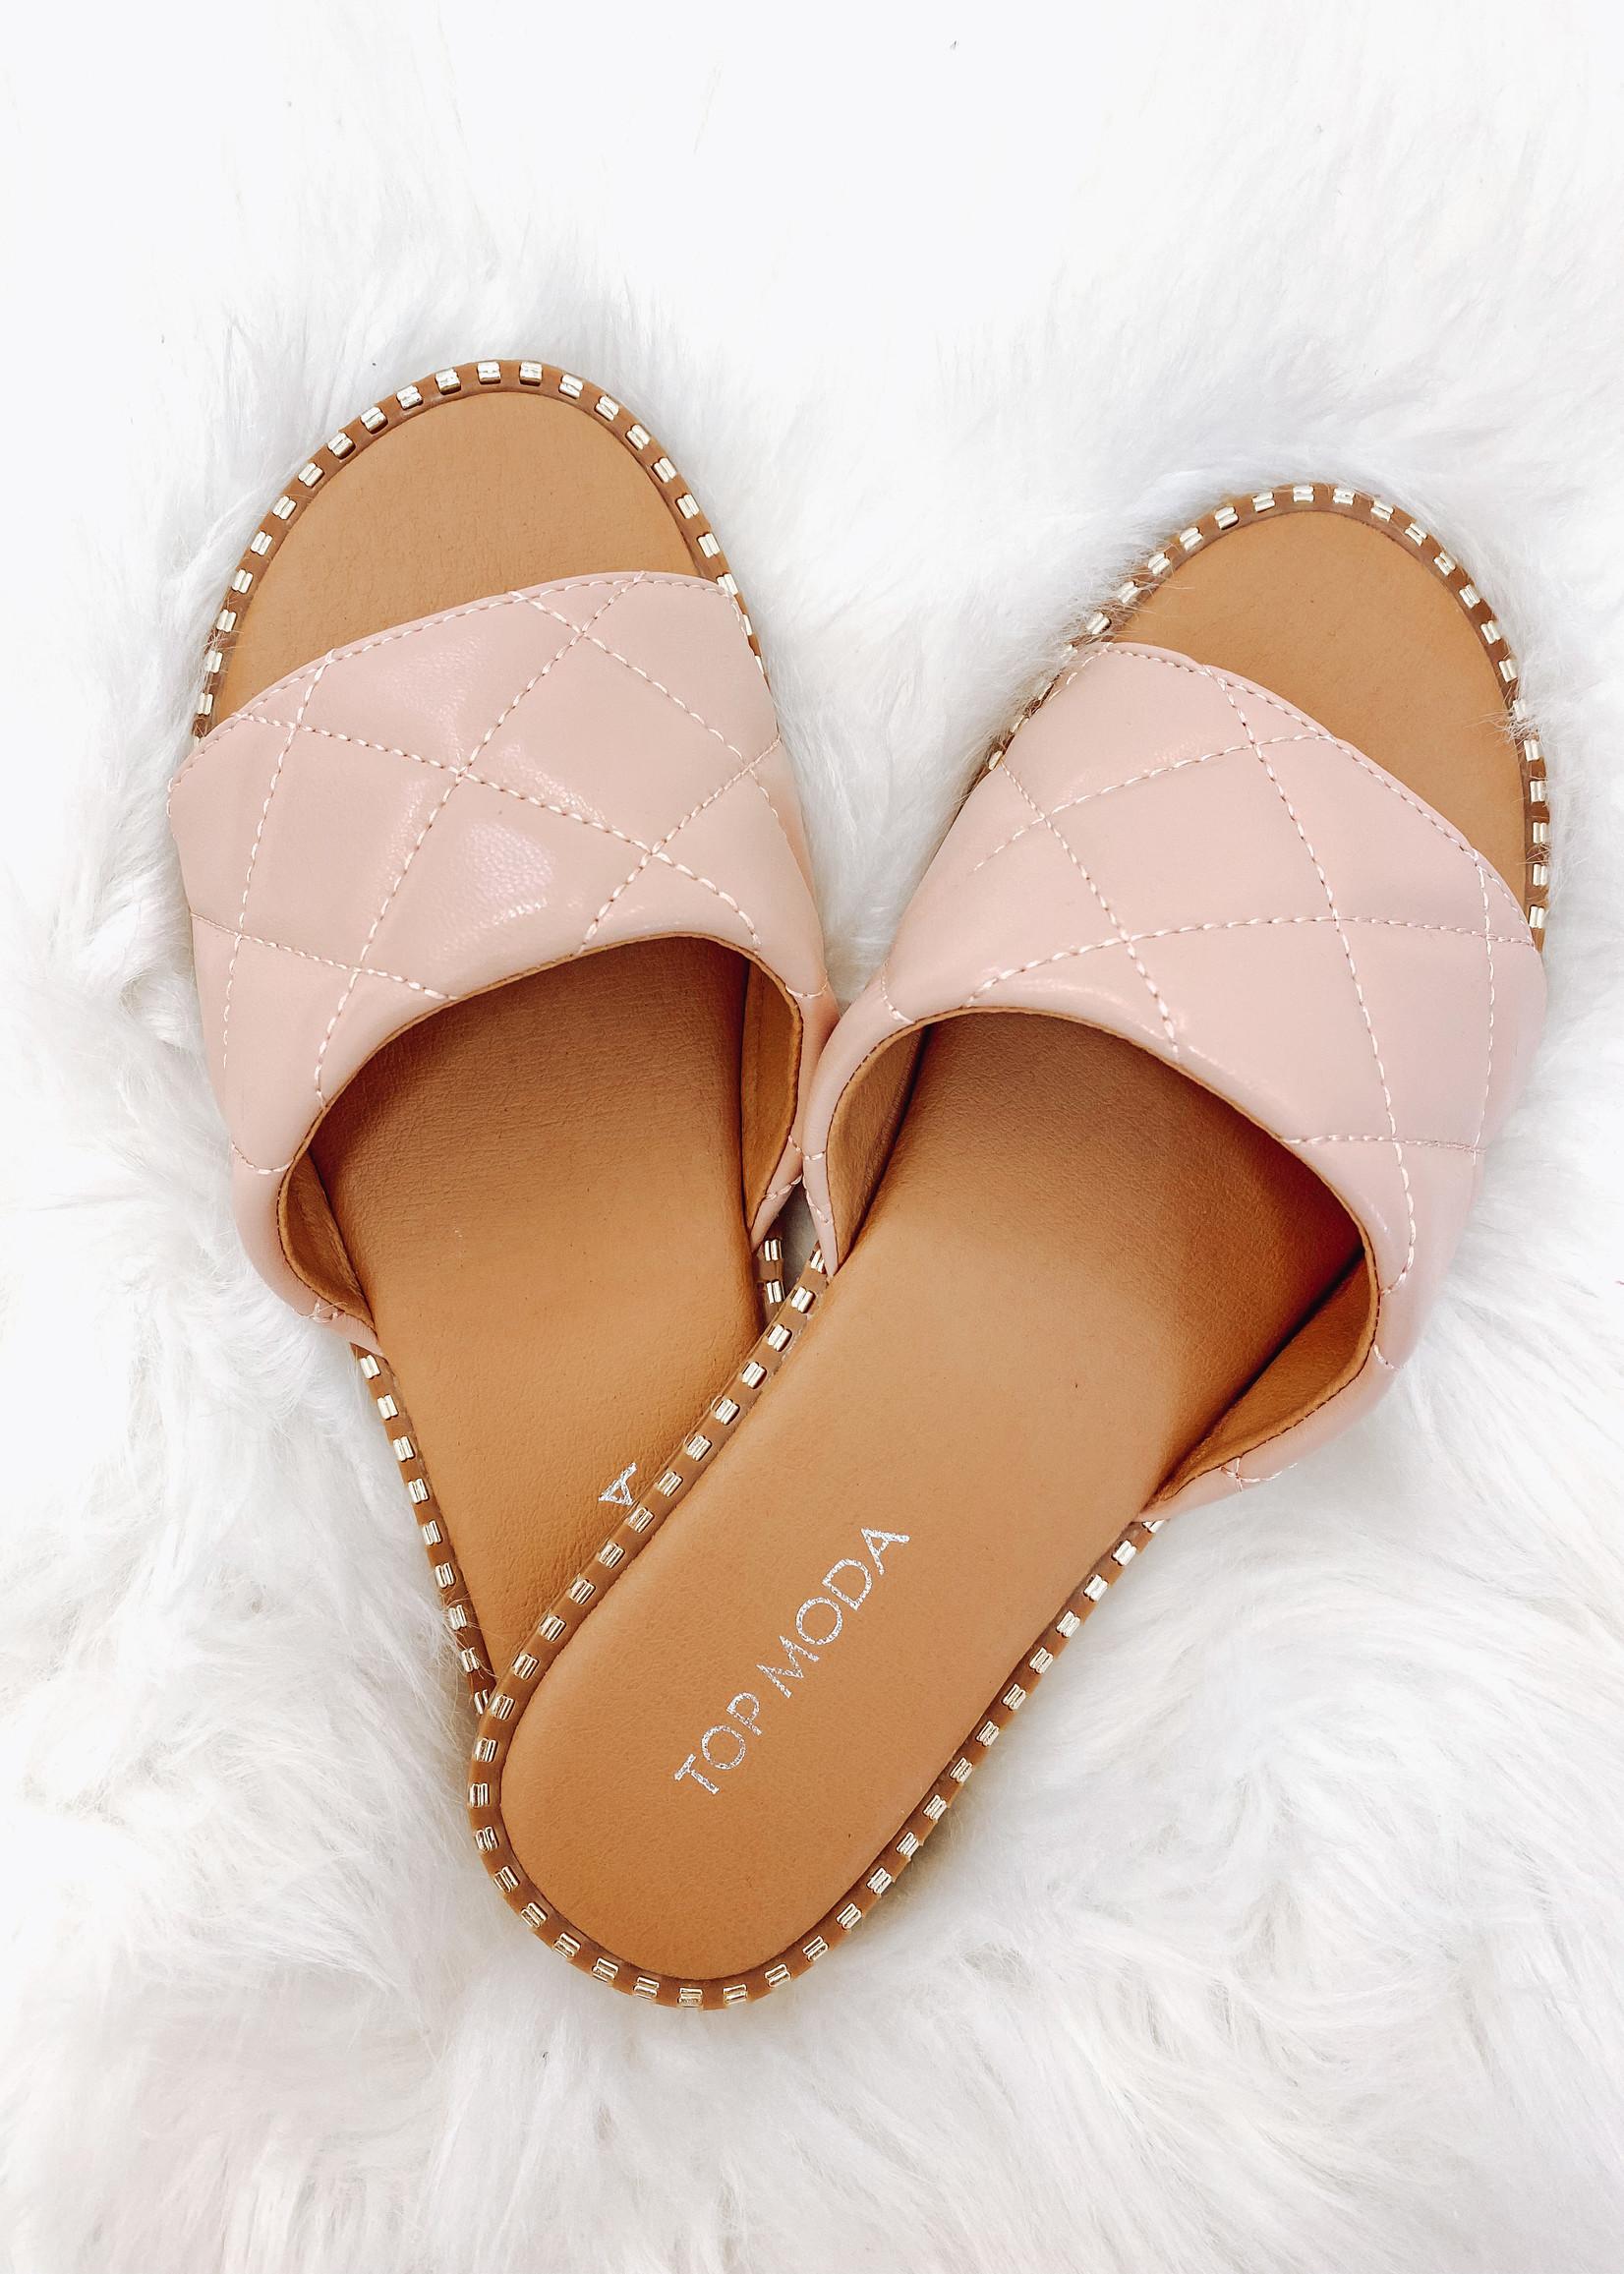 The Mich Peep Toe Sandal